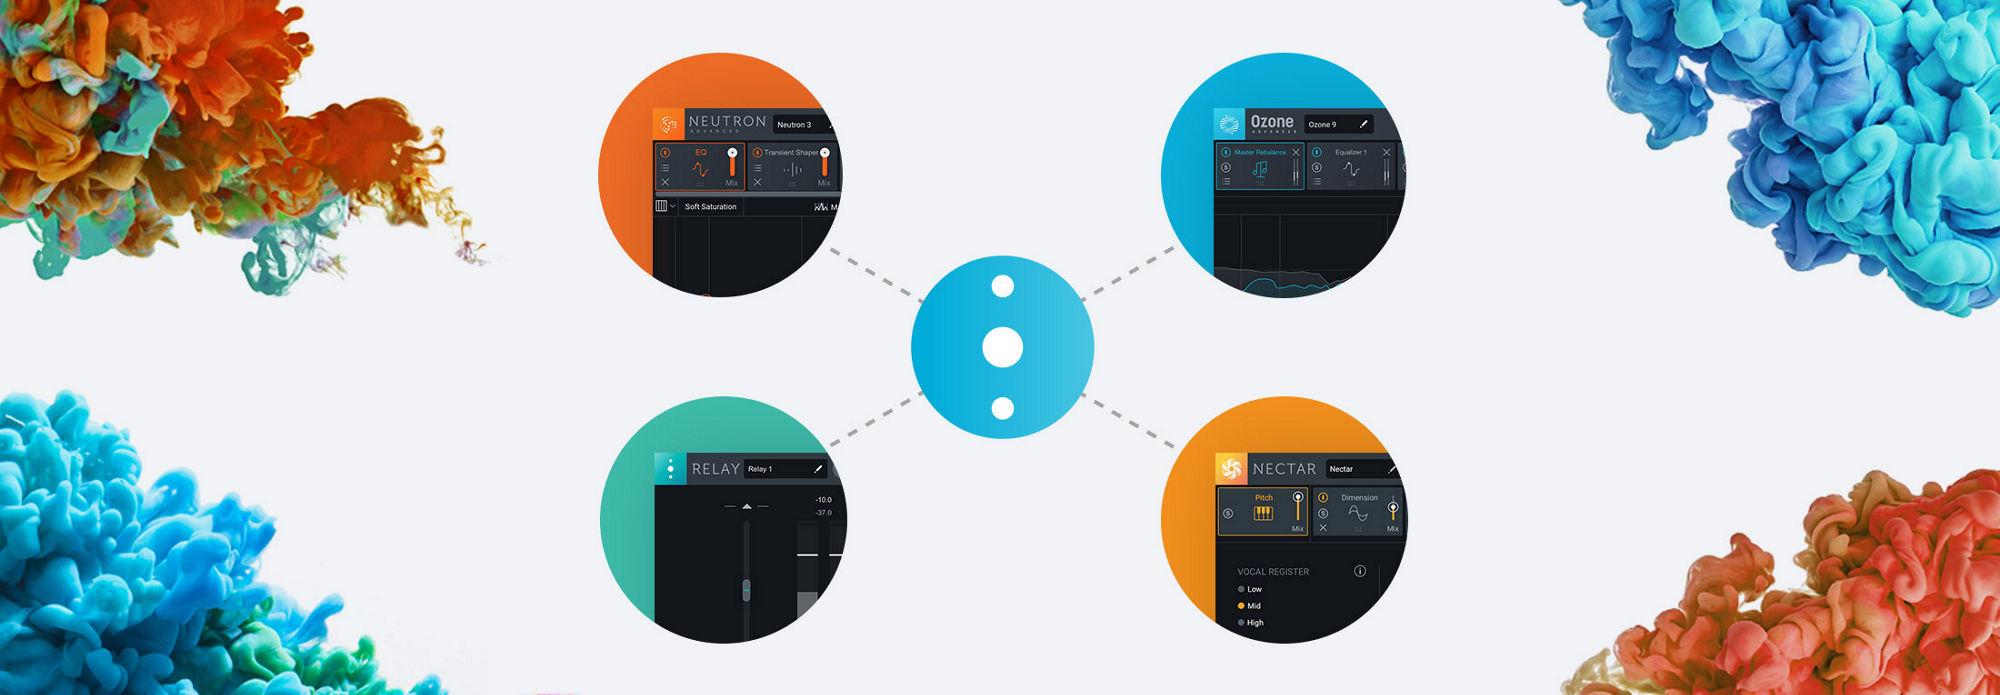 iZotope Inter-plugin Communication framework